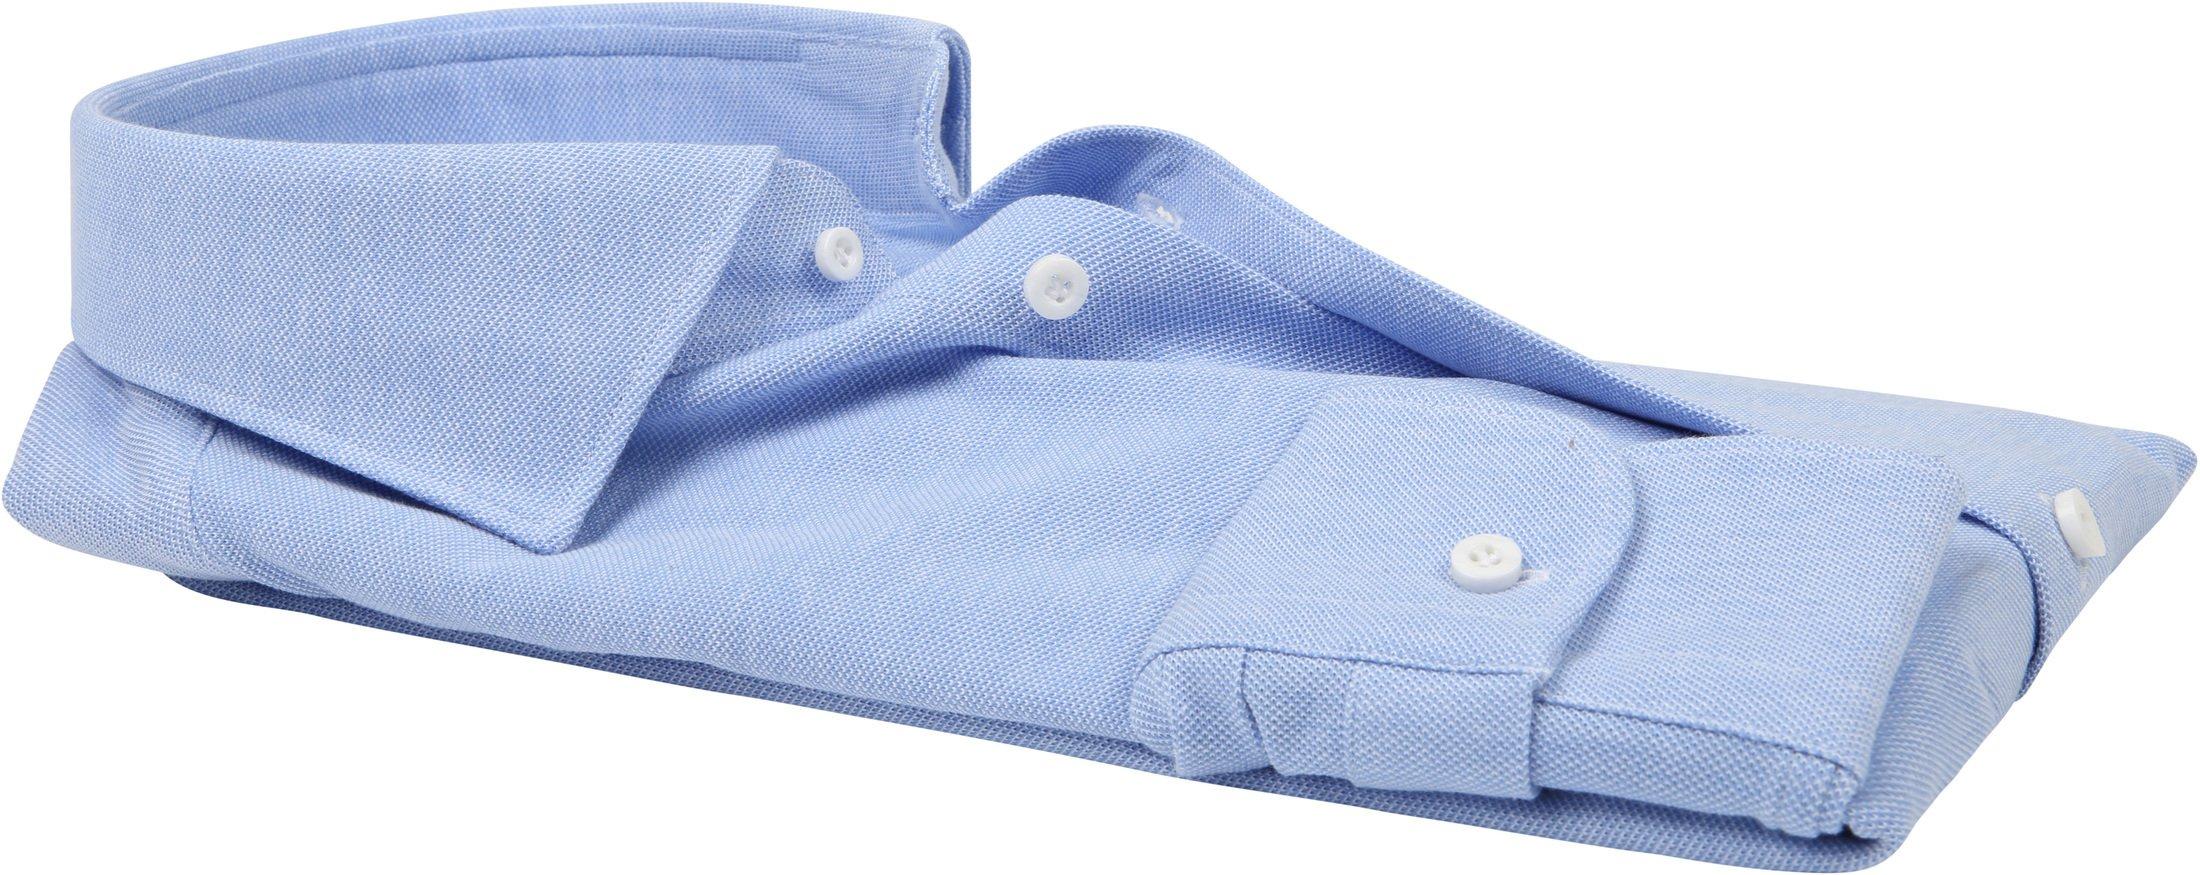 Profuomo Hemd Knitted Slim Fit Blau Foto 3